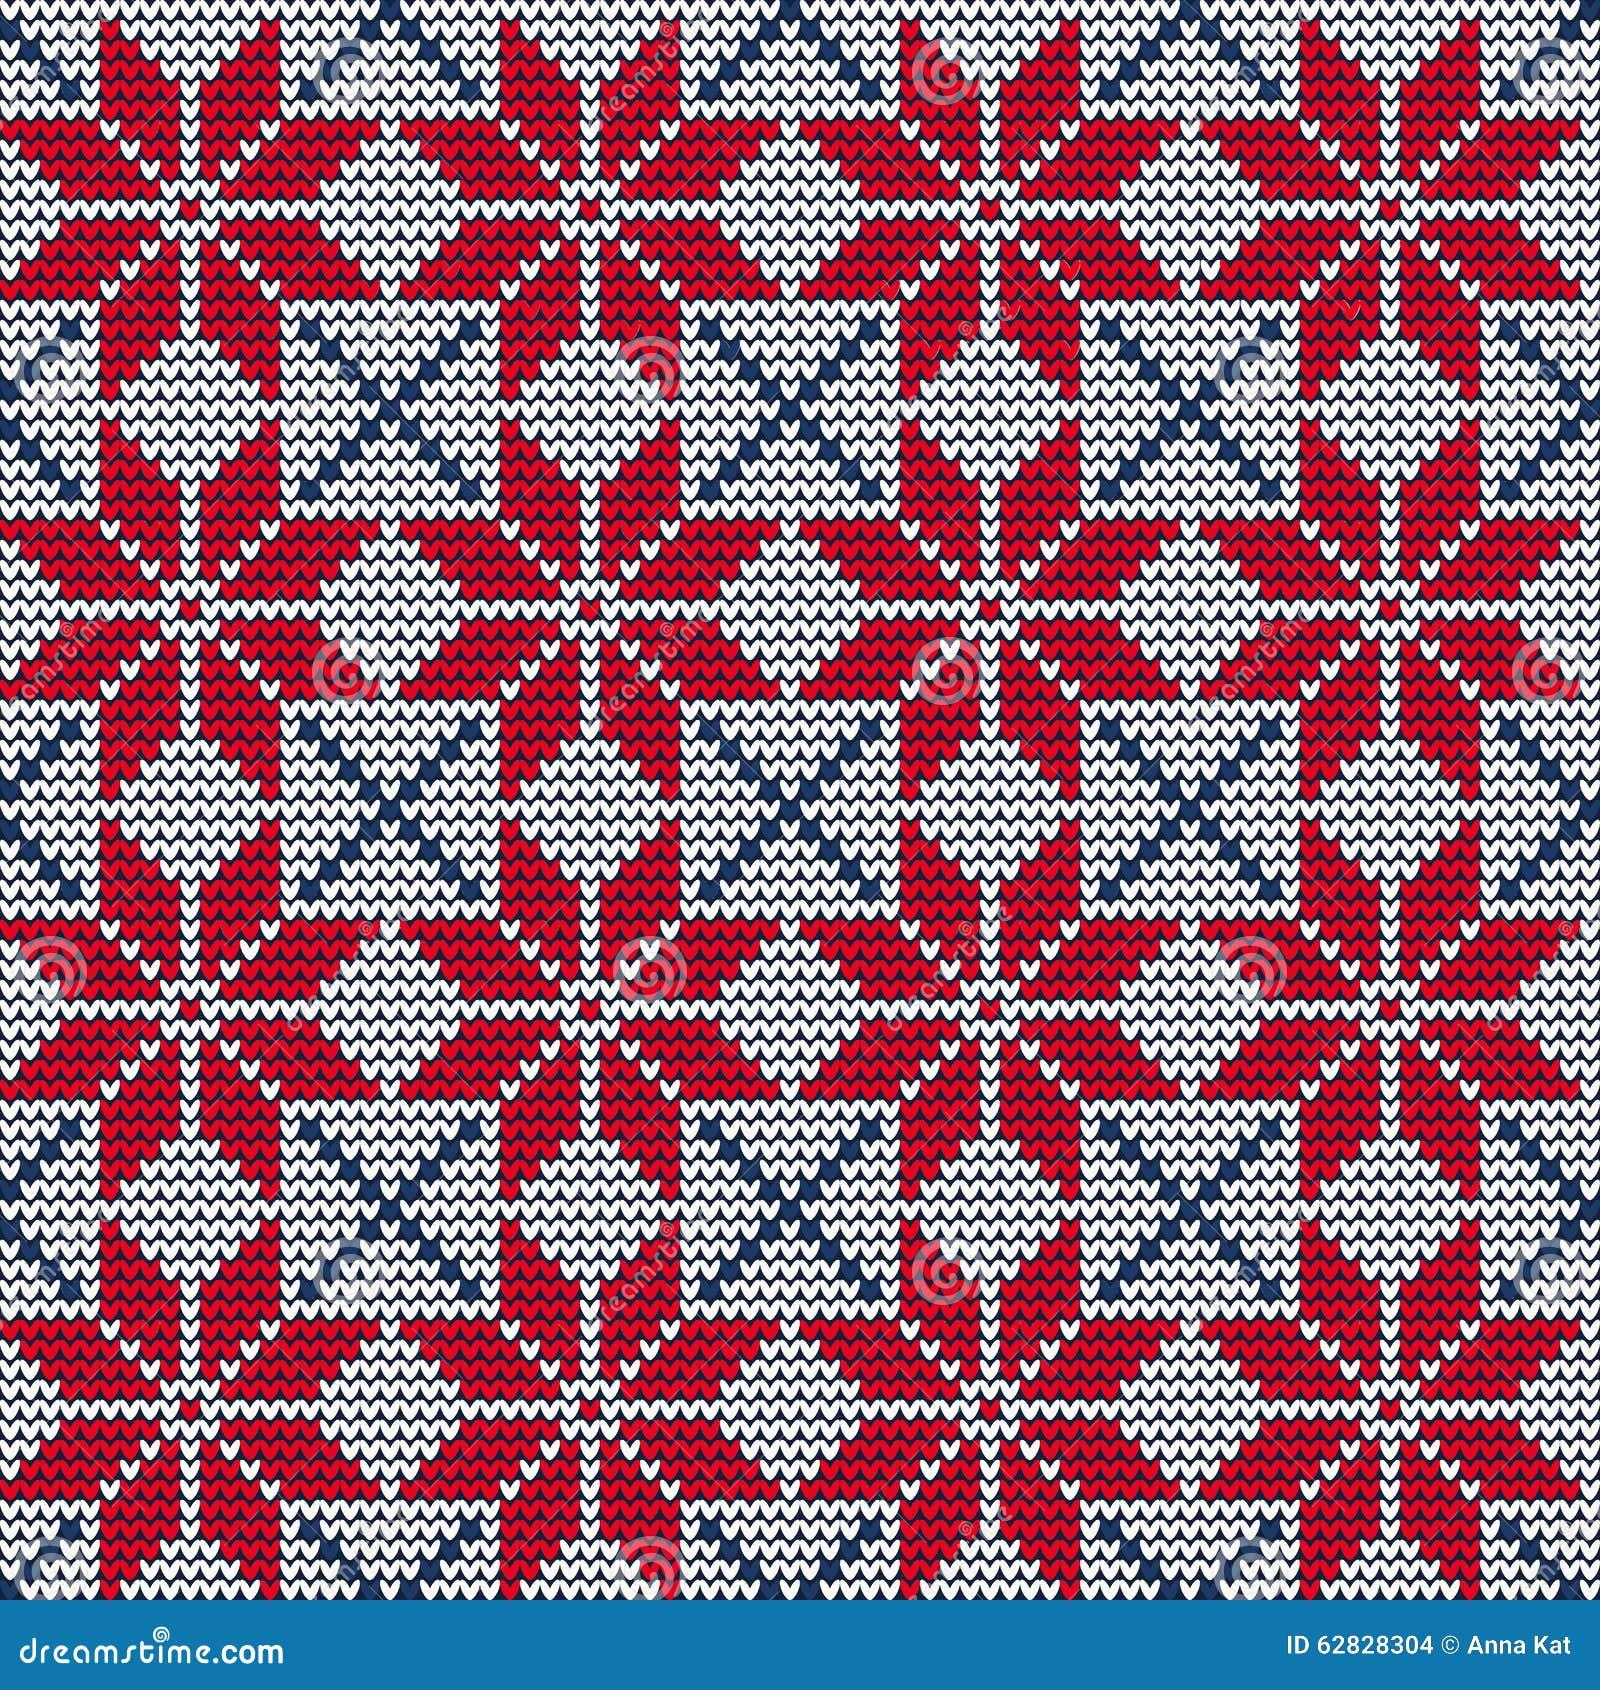 Christmas Ugly Sweater 1 Stock Vector Illustration Of Christmas 62828304,Bezalel Academy Of Arts And Design Jerusalem